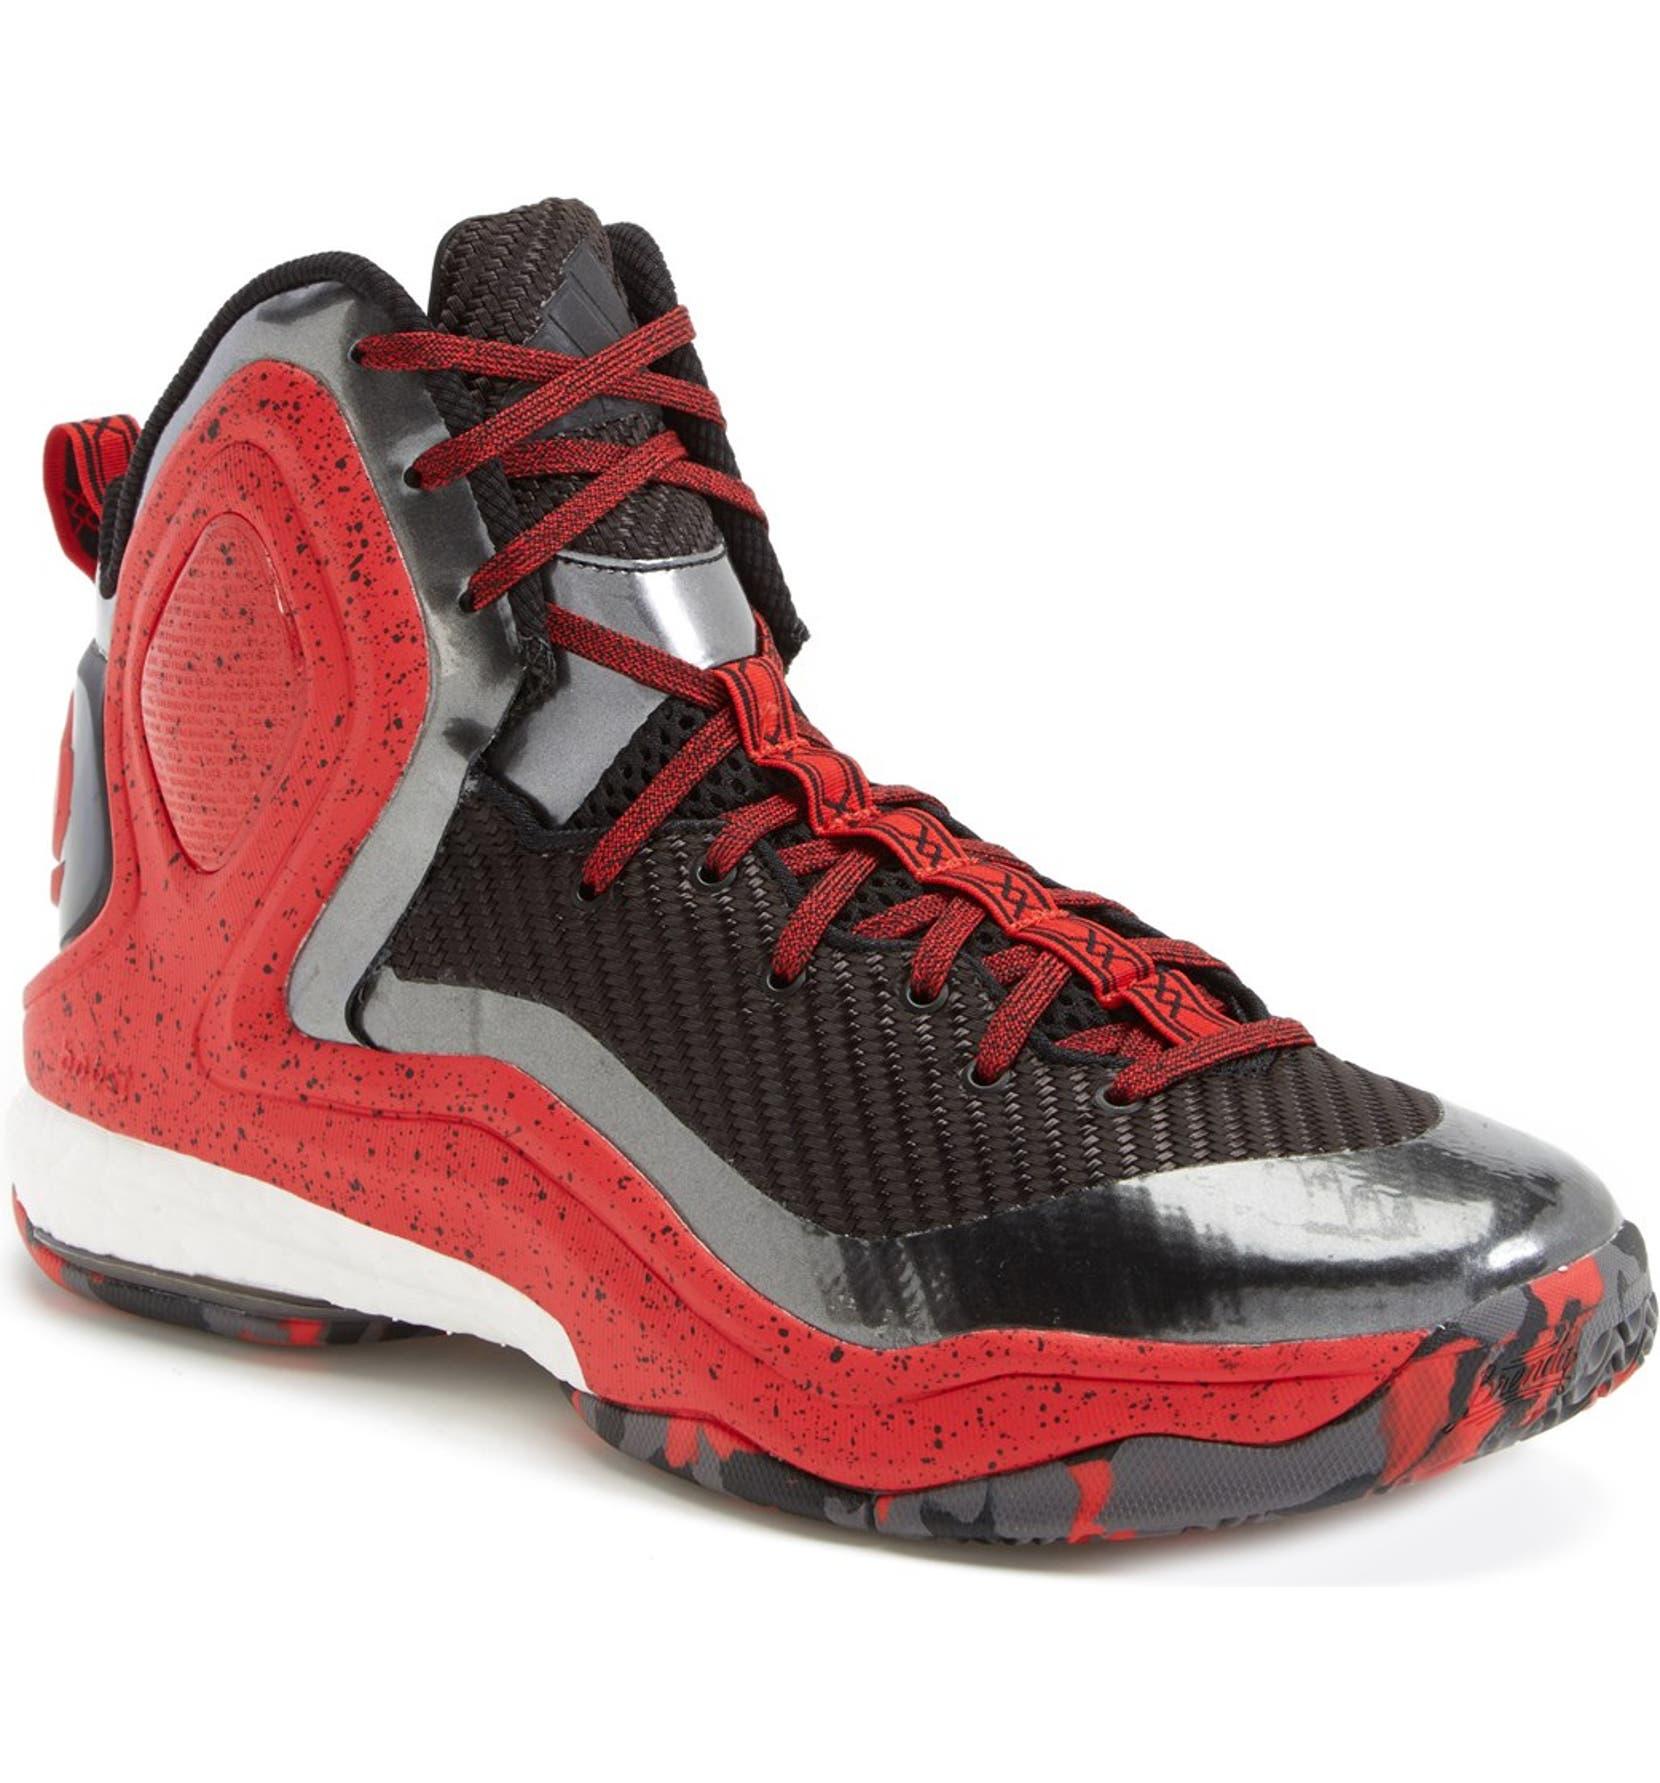 buy popular 68078 768c7 adidas D Rose 5 - Boost Woven Basketball Shoe (Men)  Nordstr